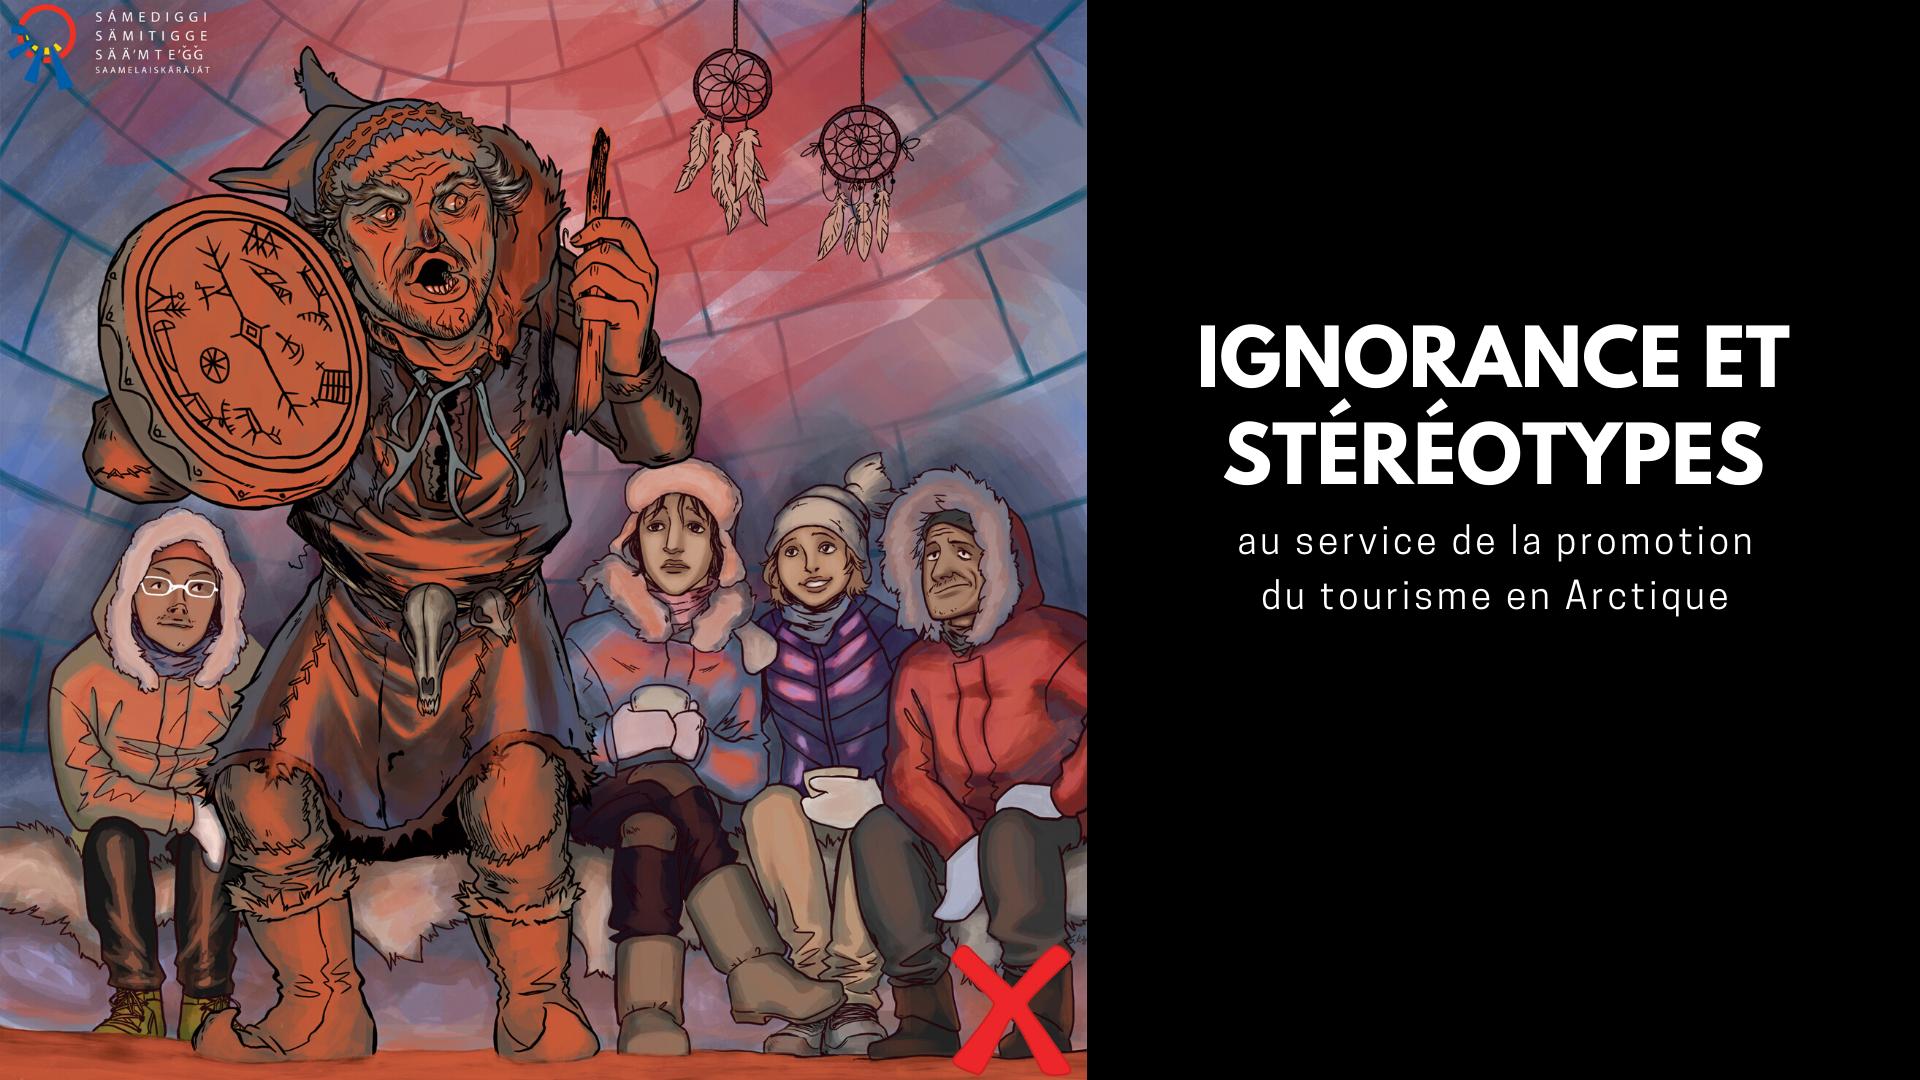 Ignorance et stéréotypes